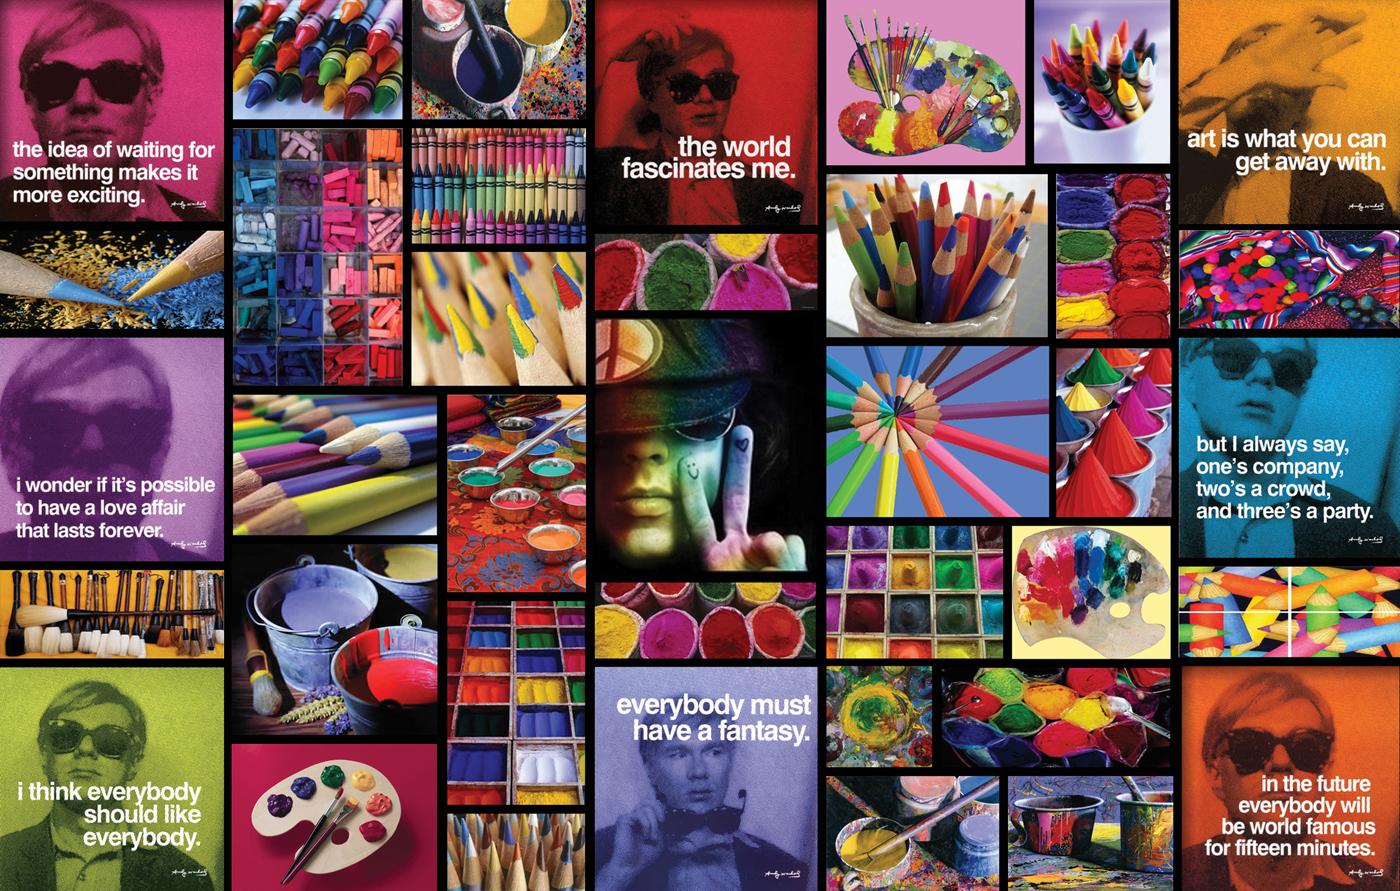 external image Andy_Warhol_Artsy_Background_by_gholder.jpg